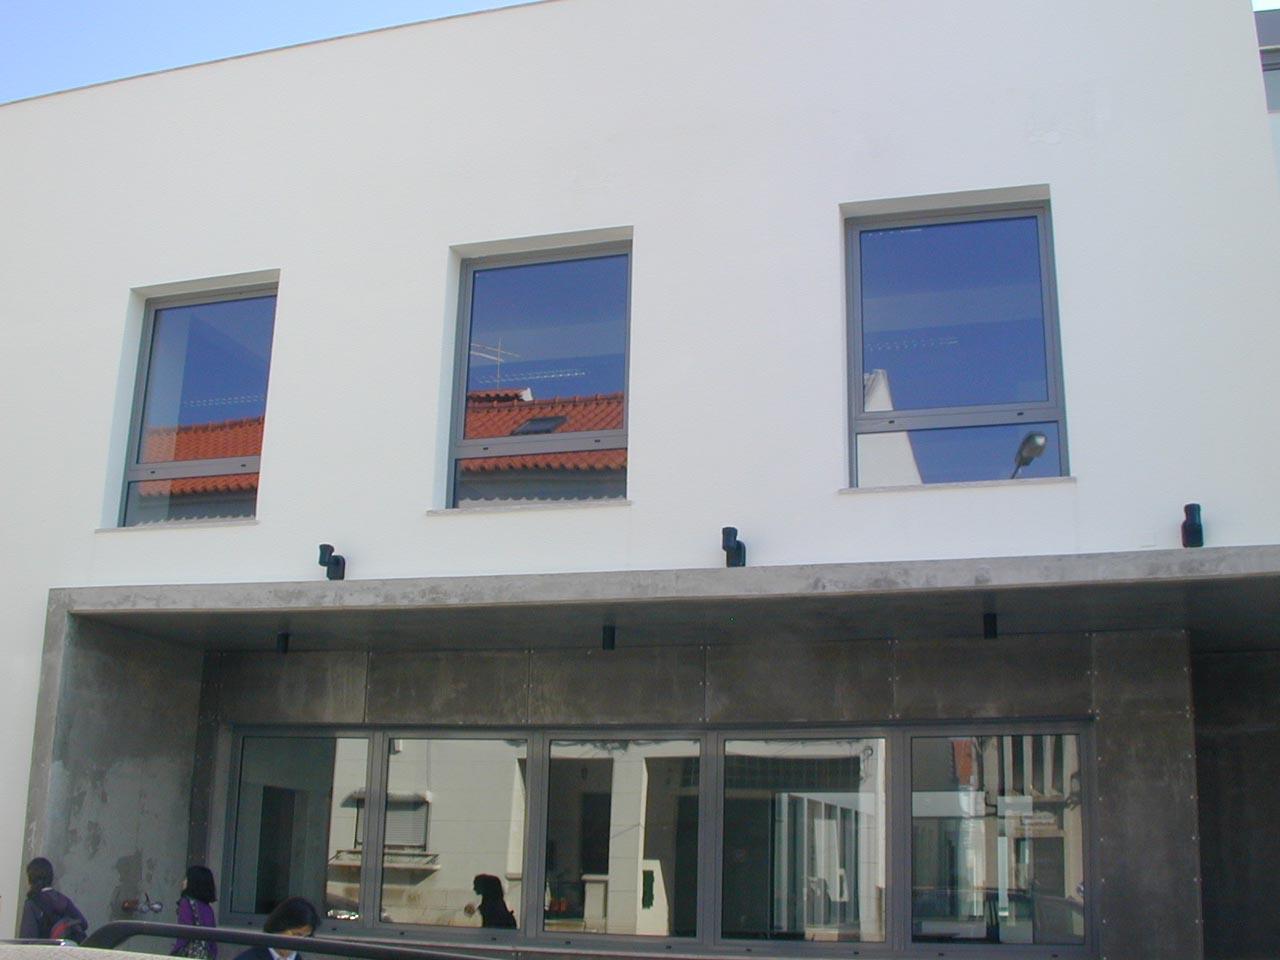 https://www.araujo-arquitectura.pt/wp-content/uploads/2020/12/DSCN0031.jpg